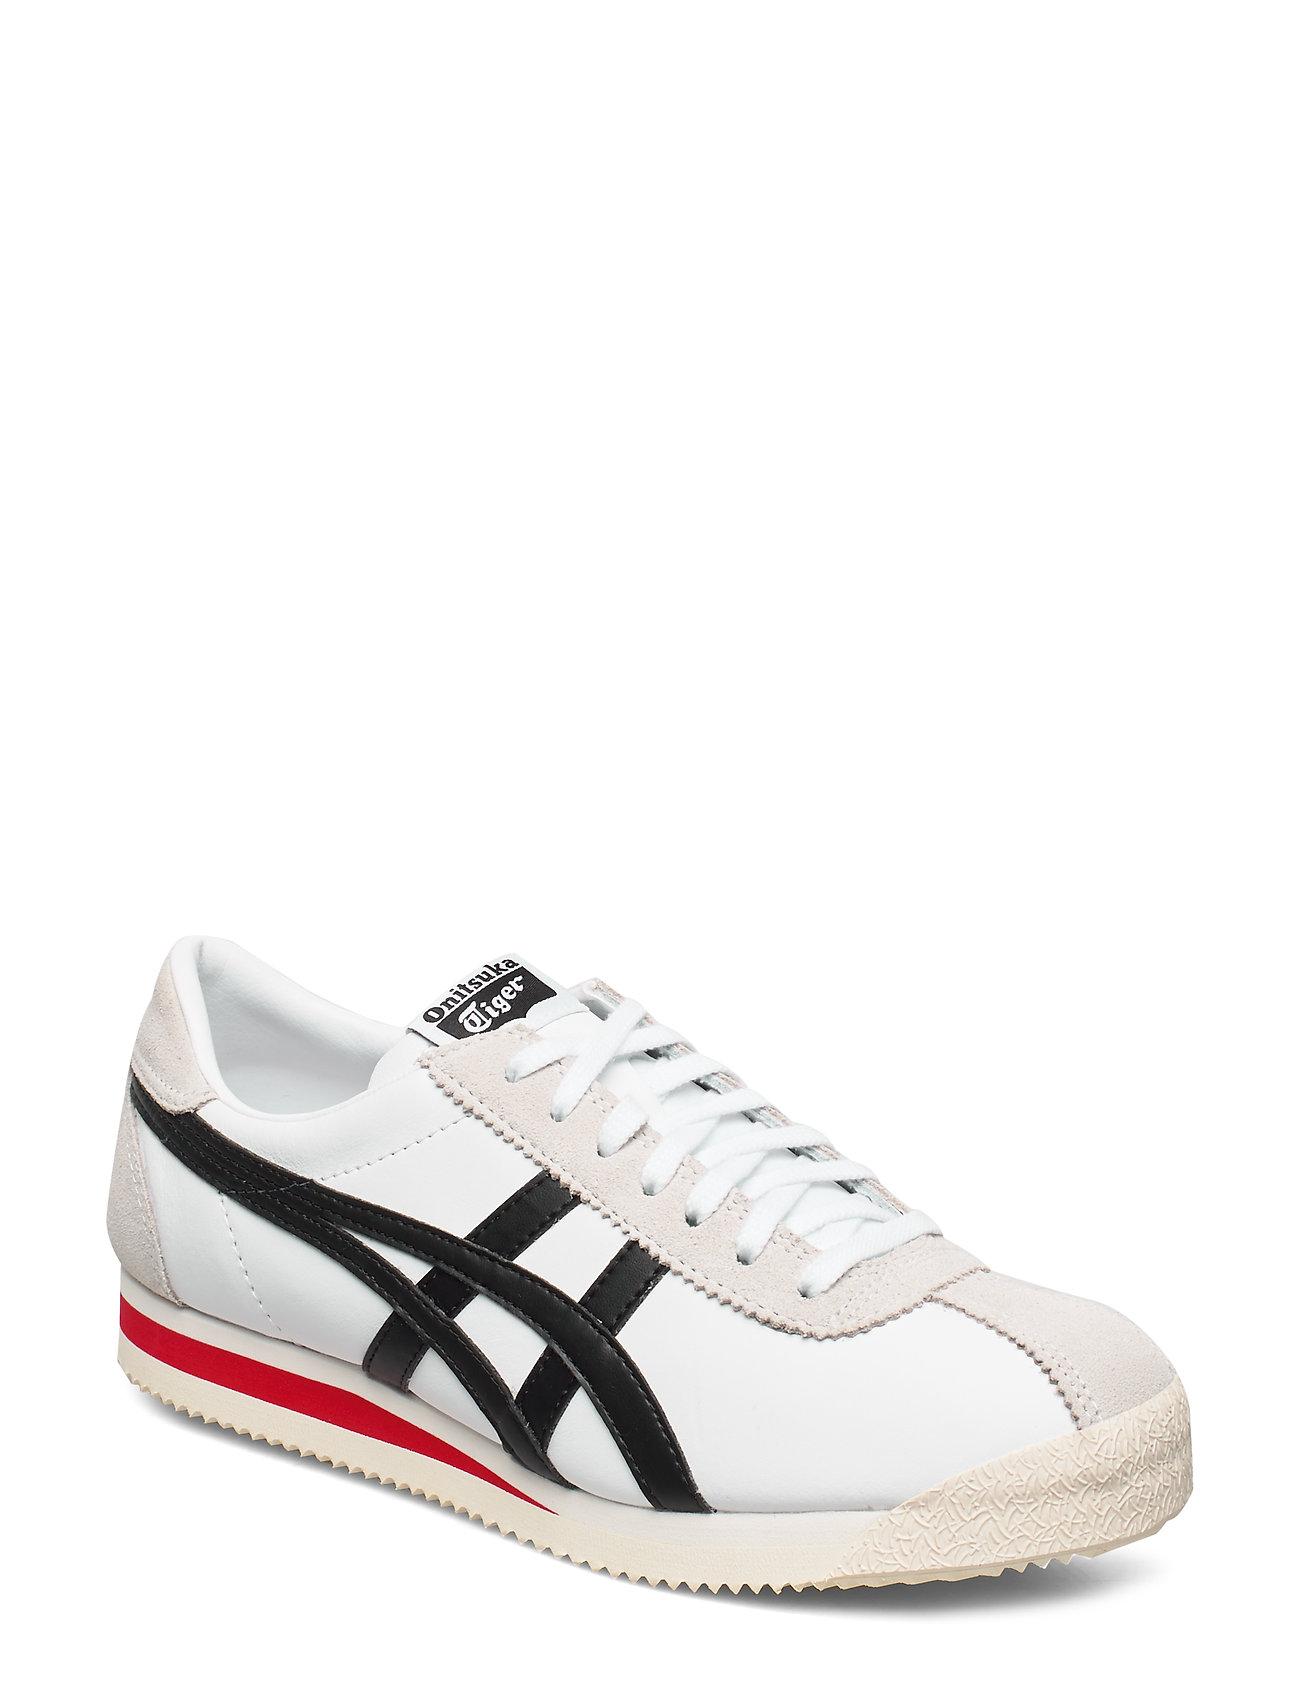 Image of Tiger Corsair Low-top Sneakers Hvid Onitsuka Tiger (3305106625)